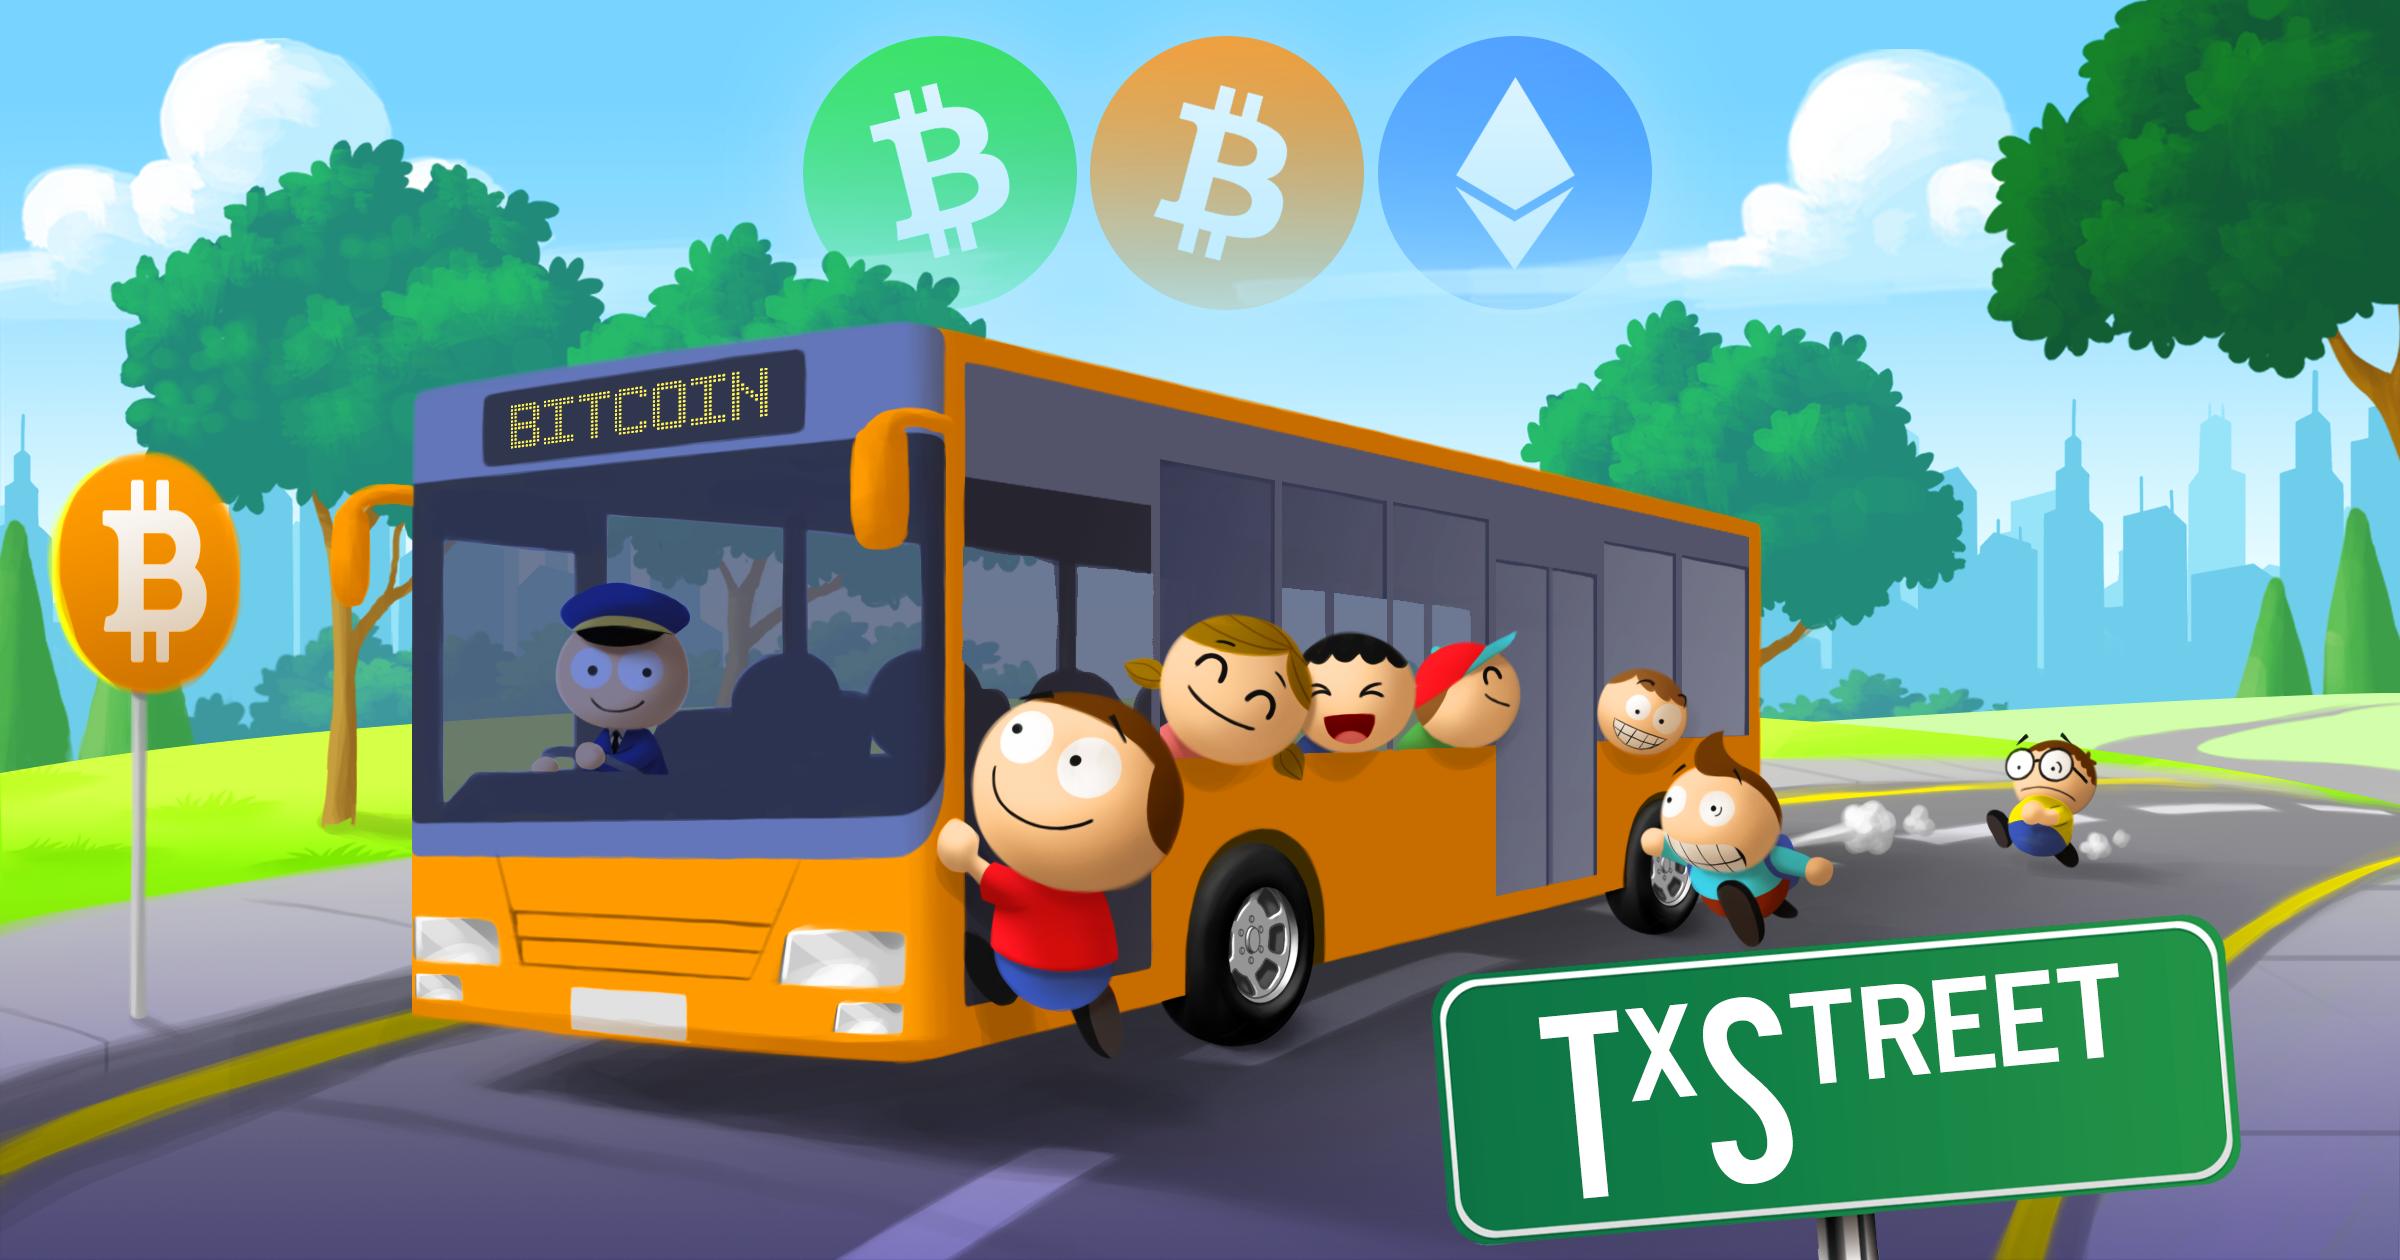 ar etrade bus bitcoin ateities sandoriai